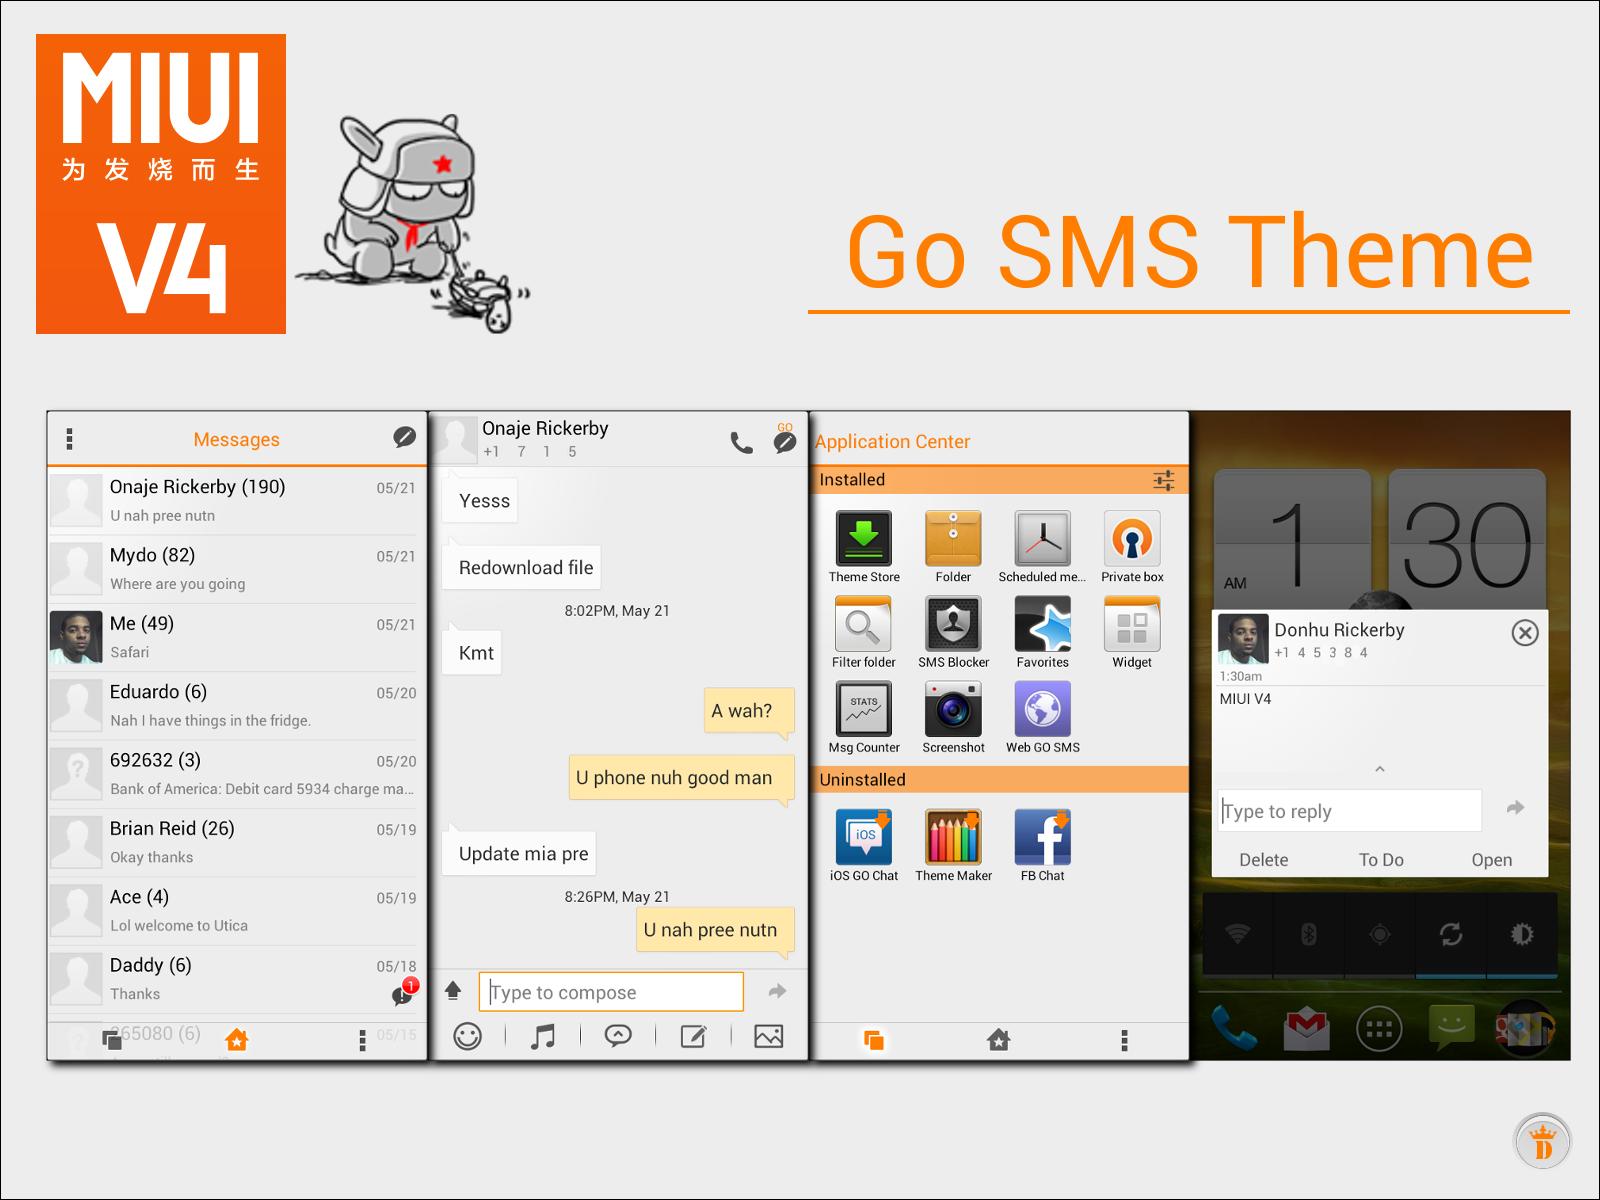 Go SMS MIUI V4 THEME by kingdonnaz